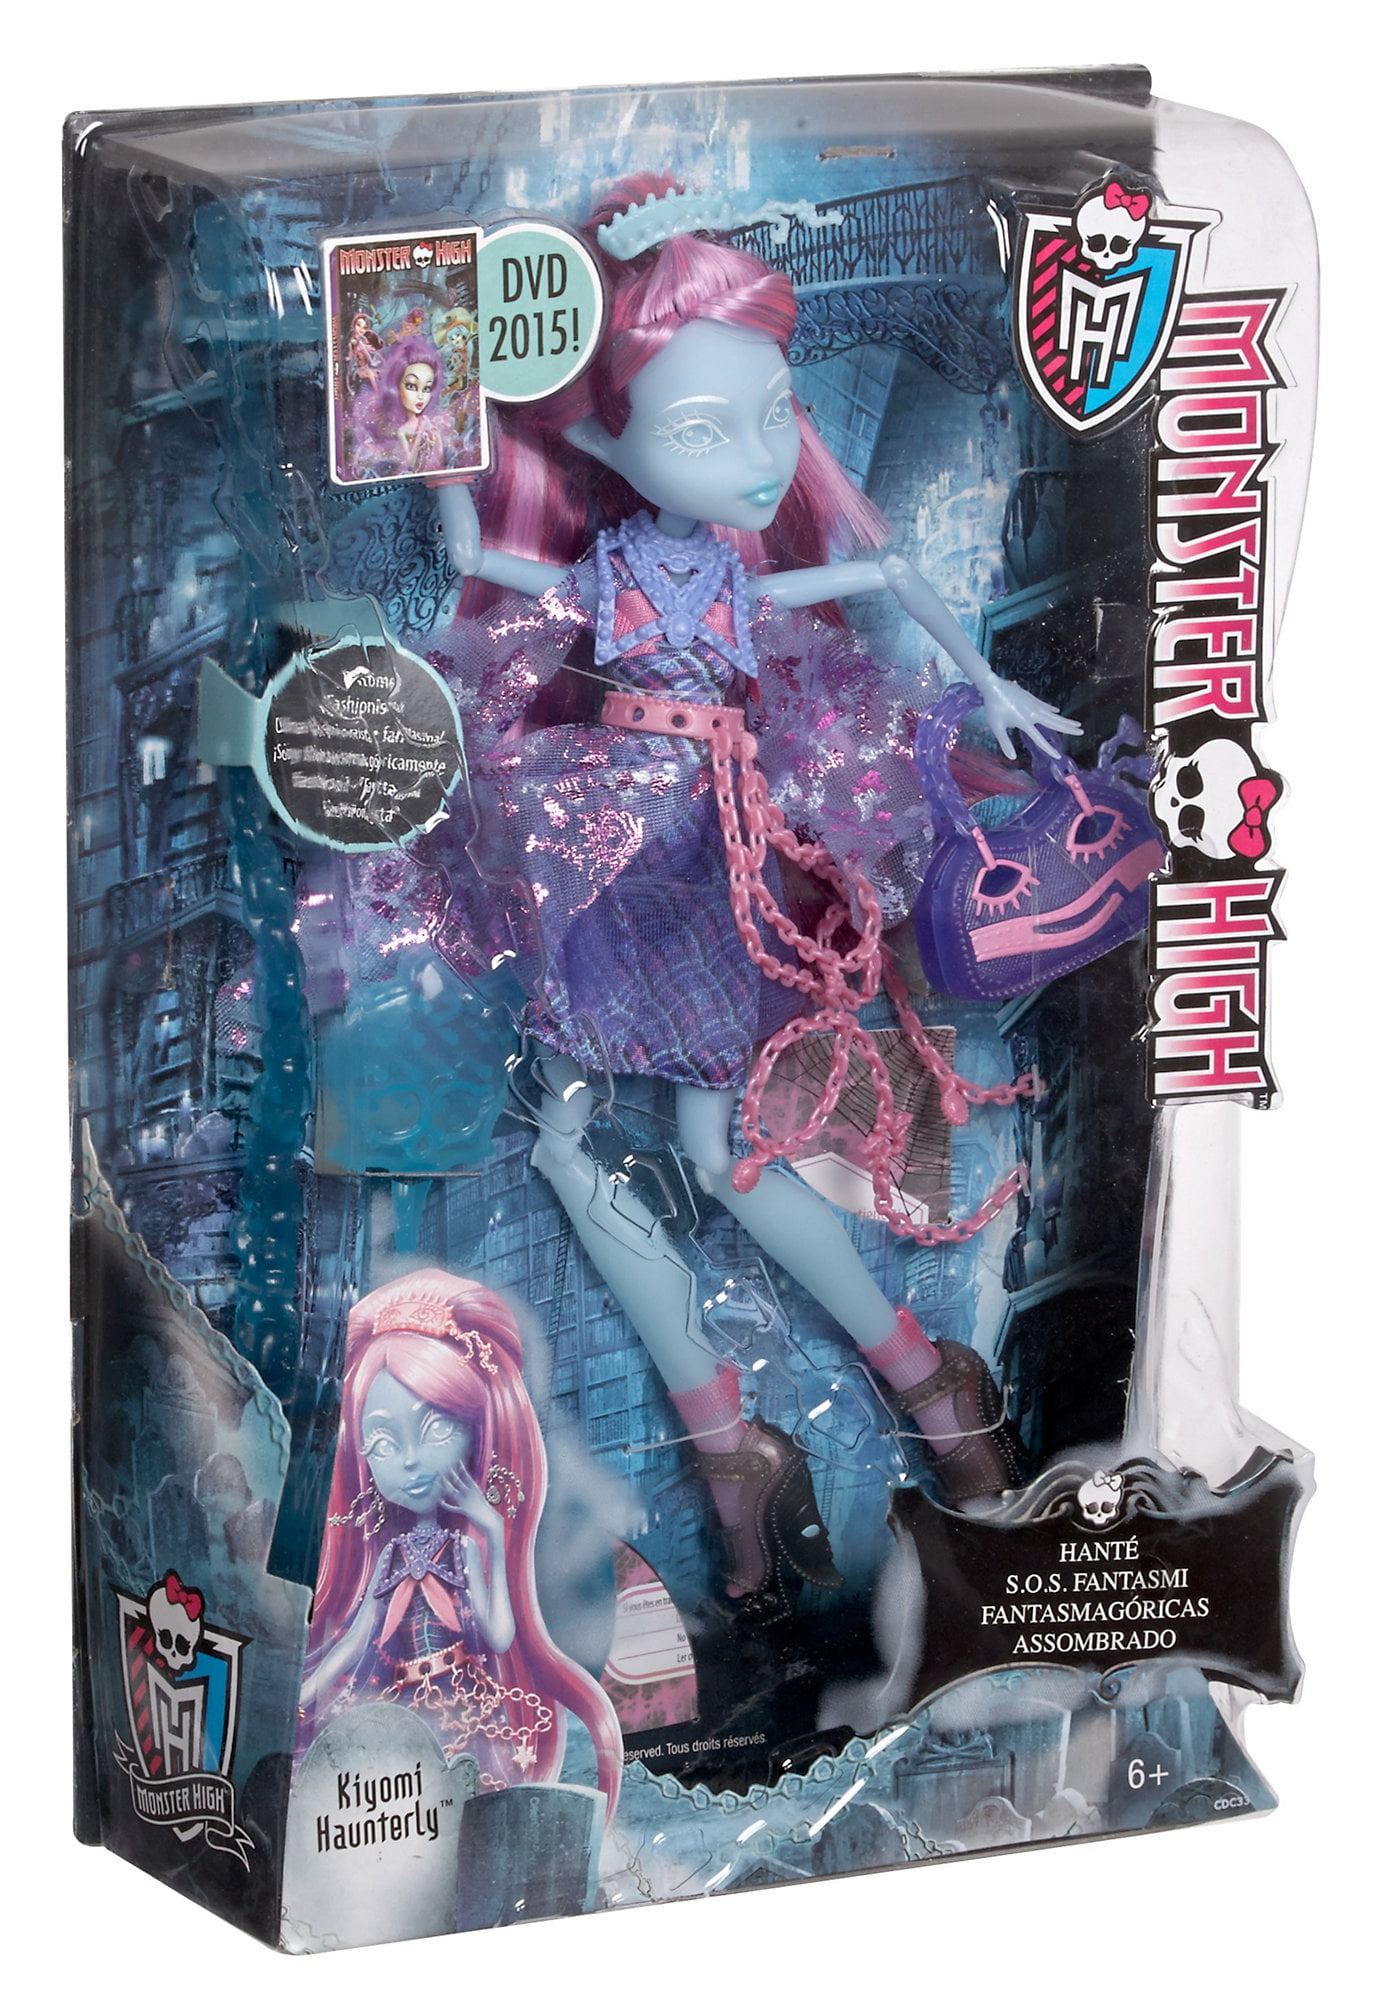 Monster High Haunted Student Spirits Kiyomi Haunterly Doll by Monster High